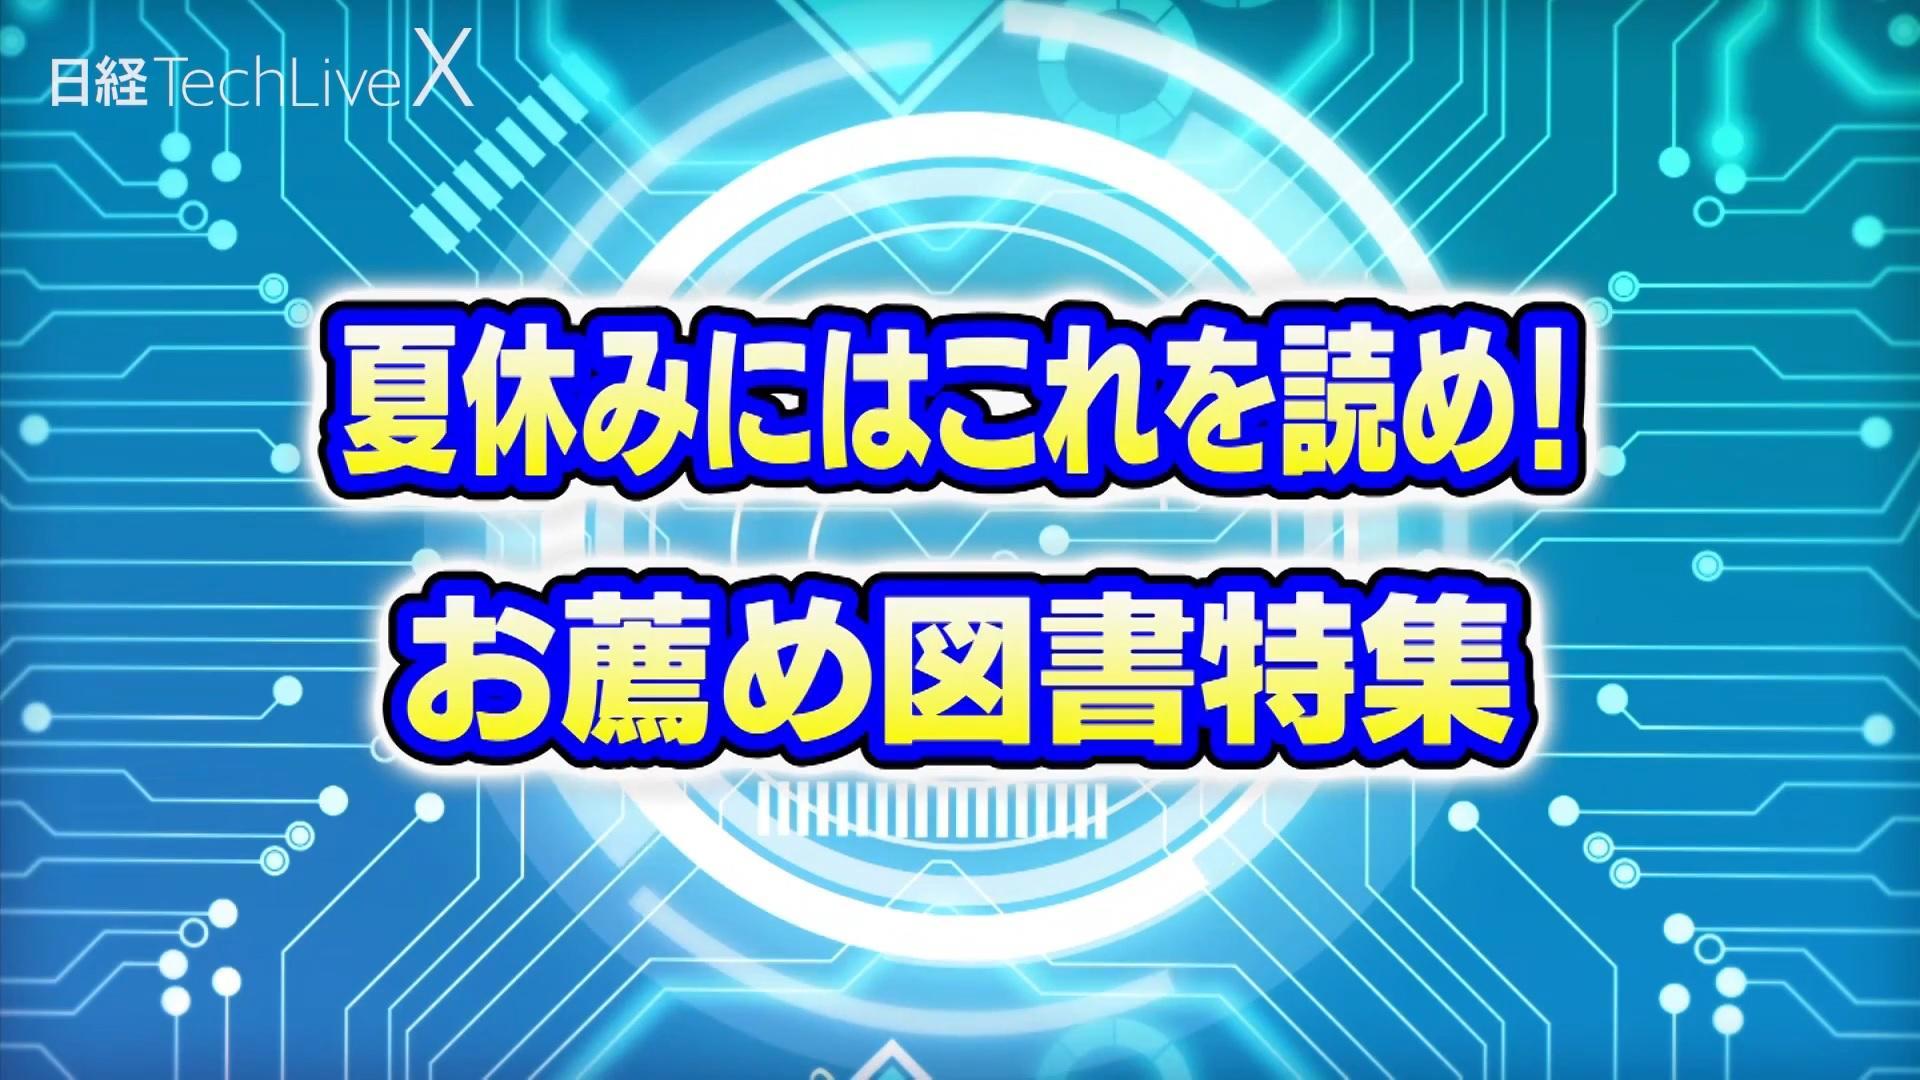 20180820_nikkeitlx0810_02.jpg